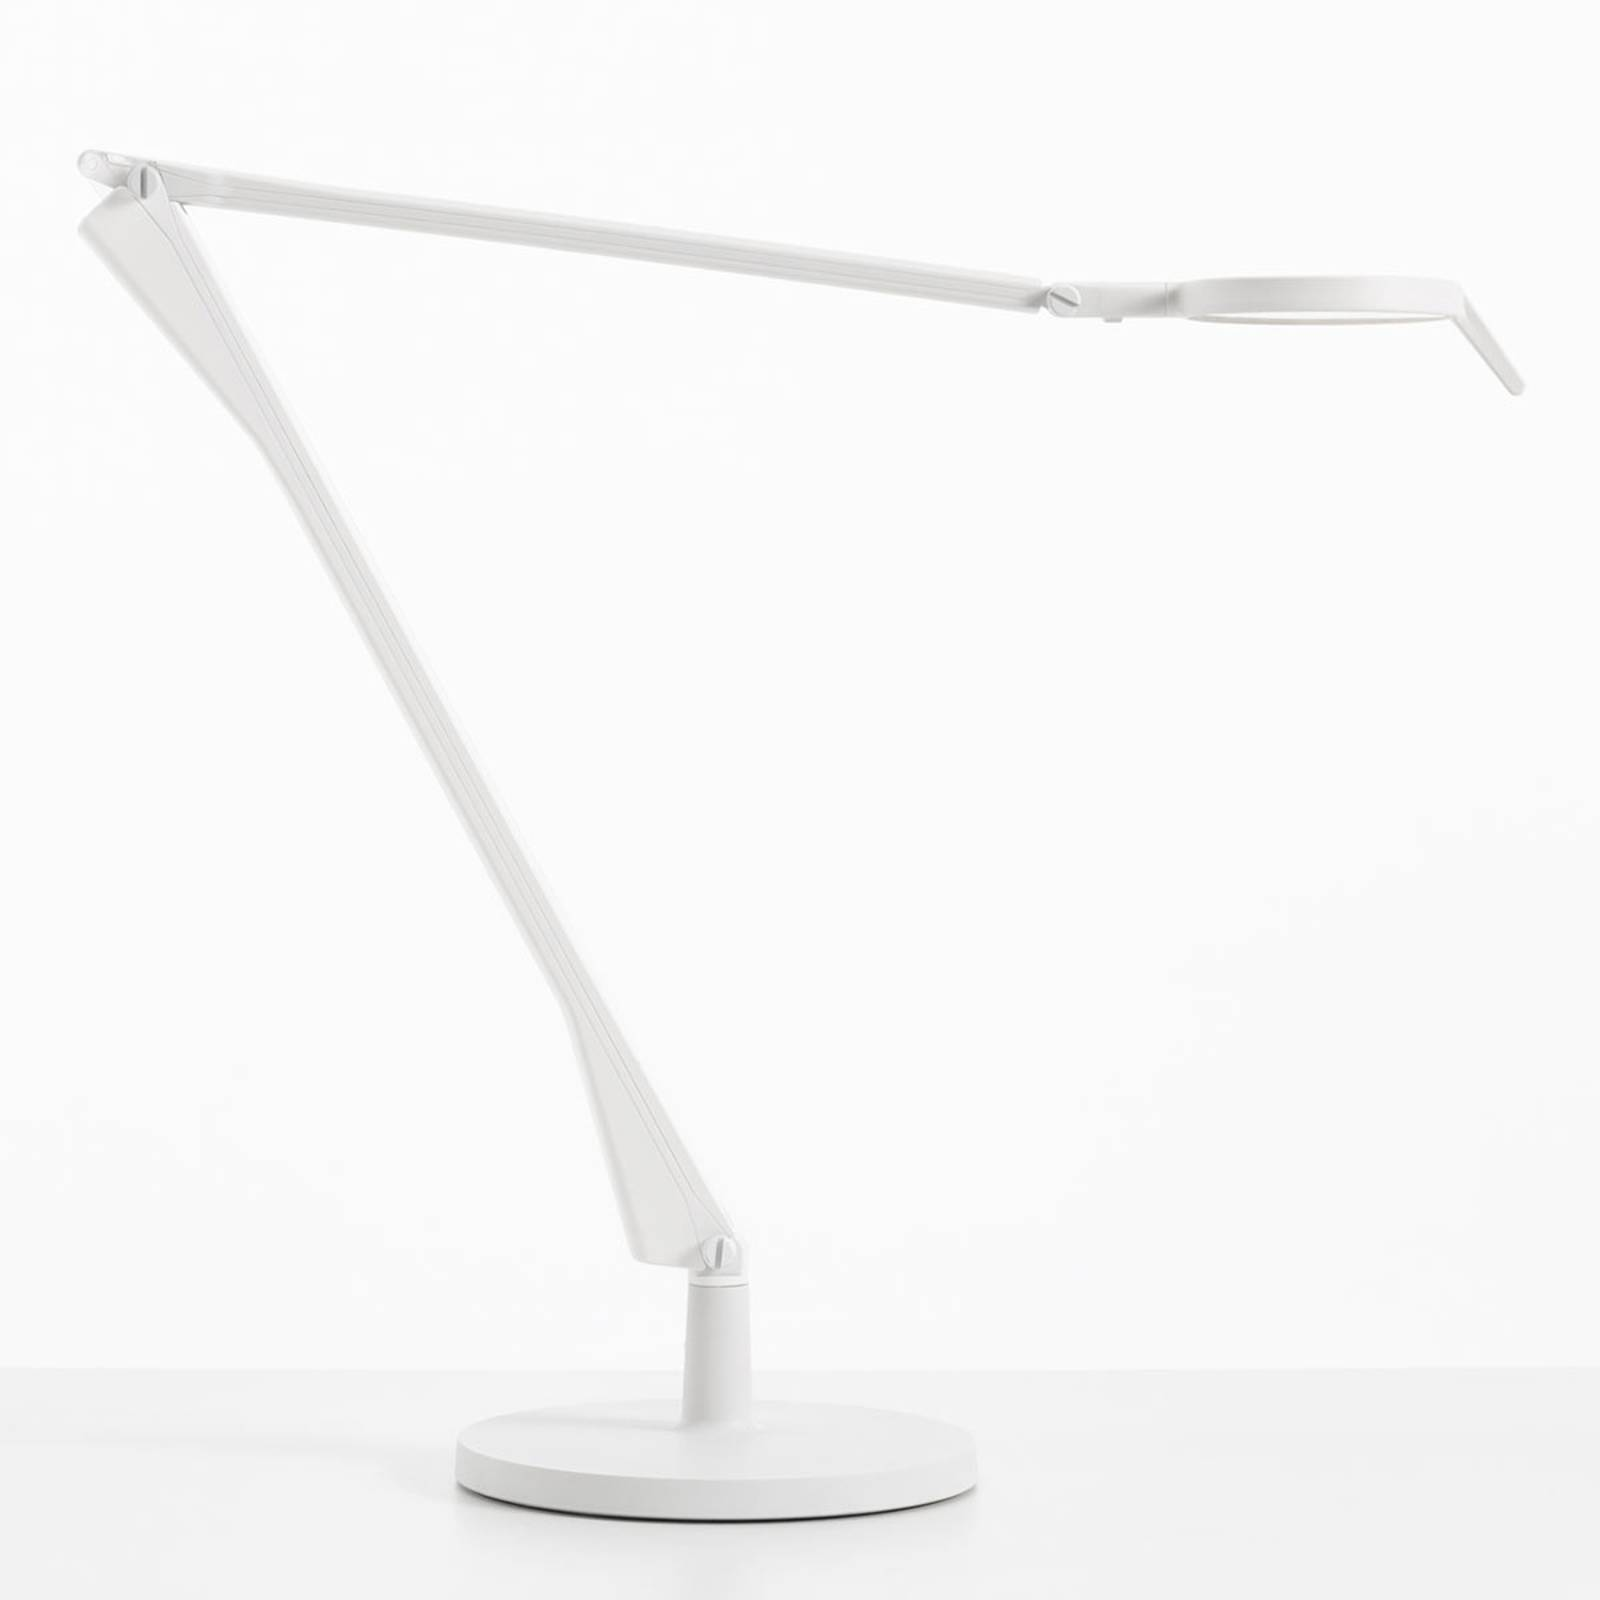 Kartell Aledin Tec -LED-pöytälamppu valkoinen